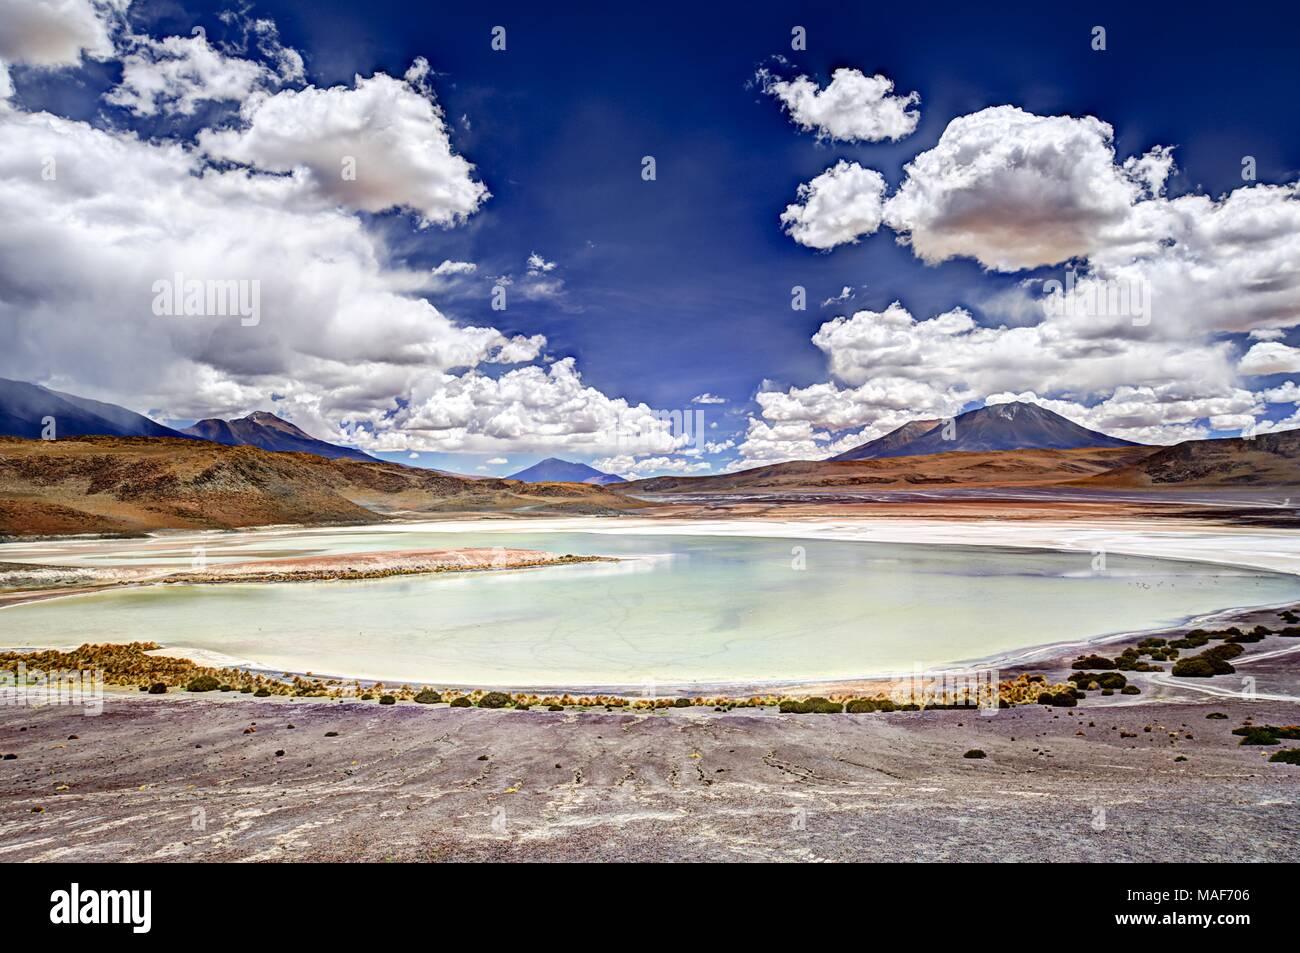 Altiplano Lagoon in Bolivia, Southamerica - Stock Image